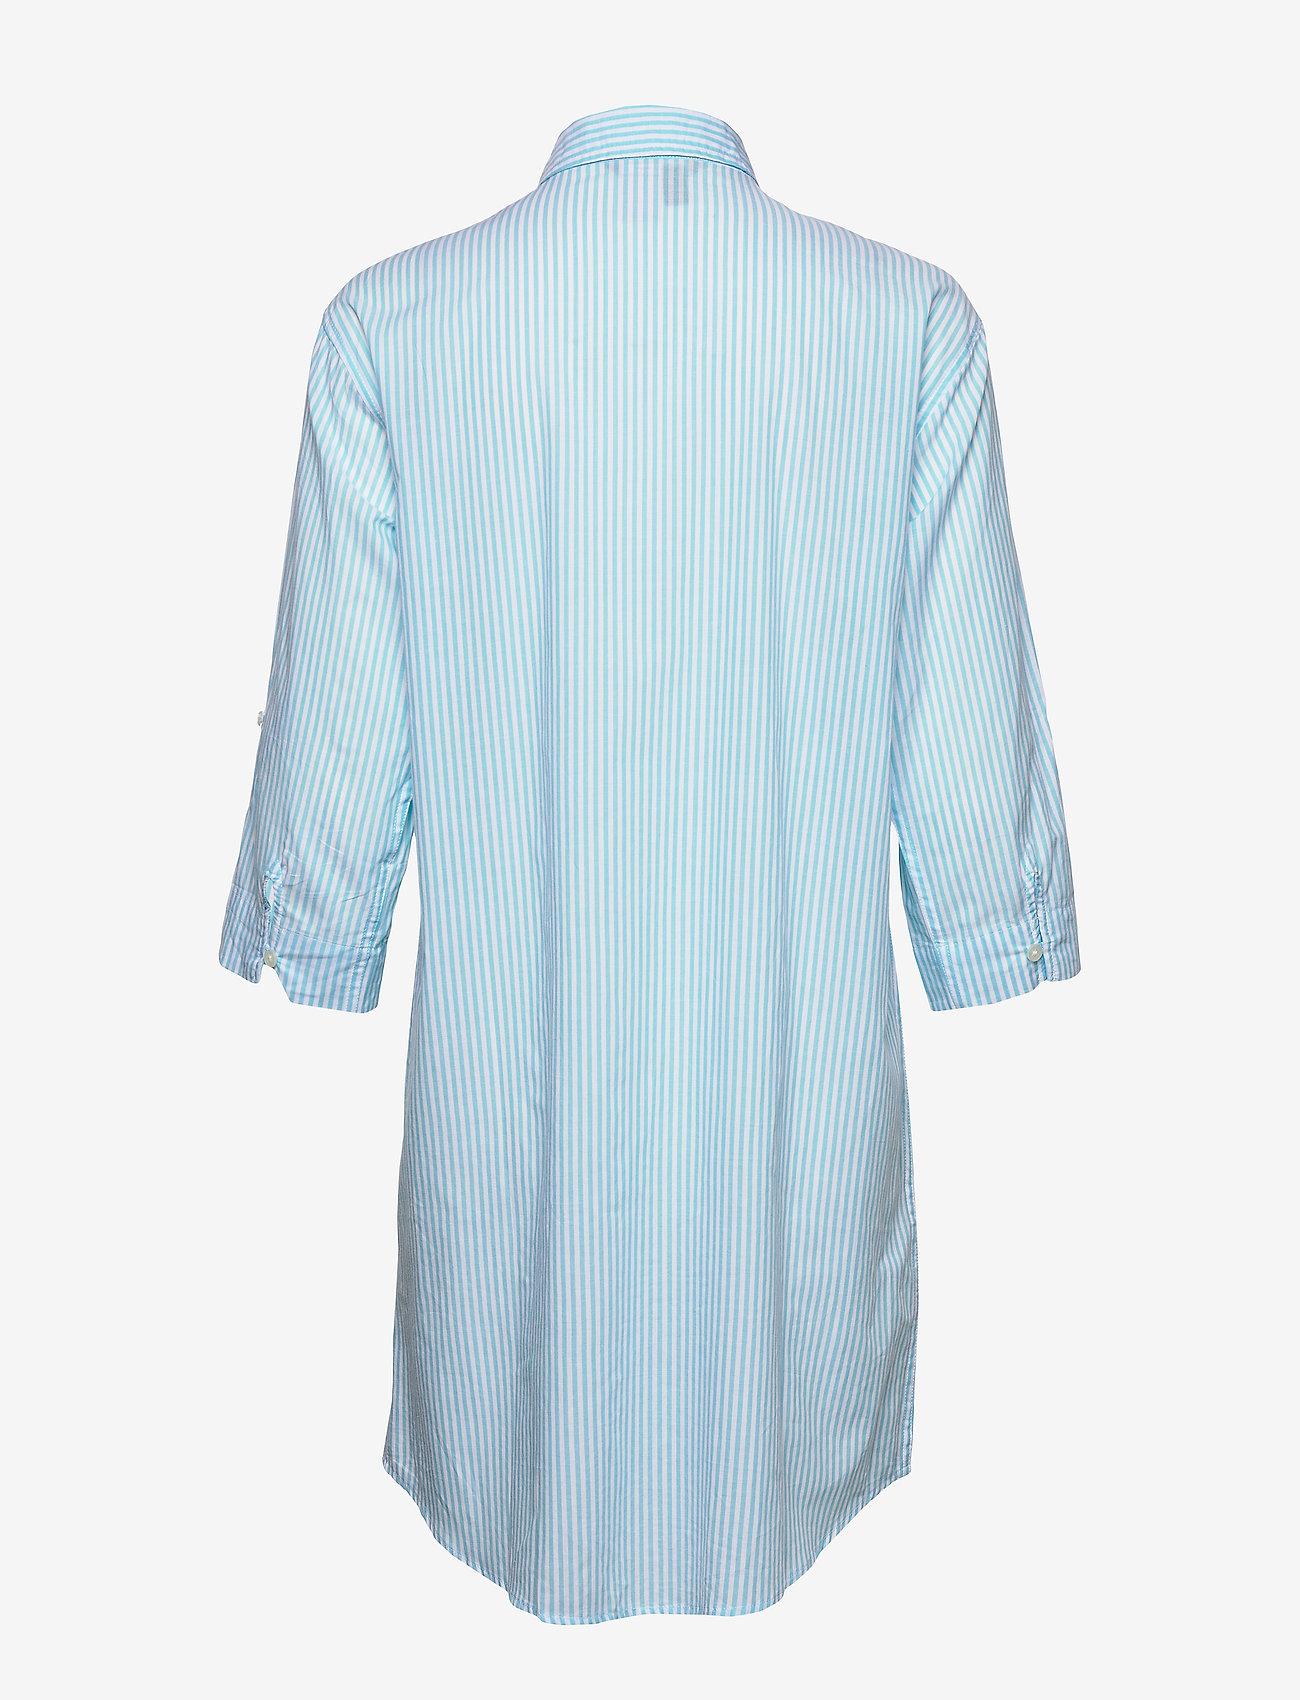 Lrl 3/4 Roll Sl. His Sleepshirt (Aqua Stripe) (699.30 kr) - Lauren Ralph Lauren Homewear UViJE0vD